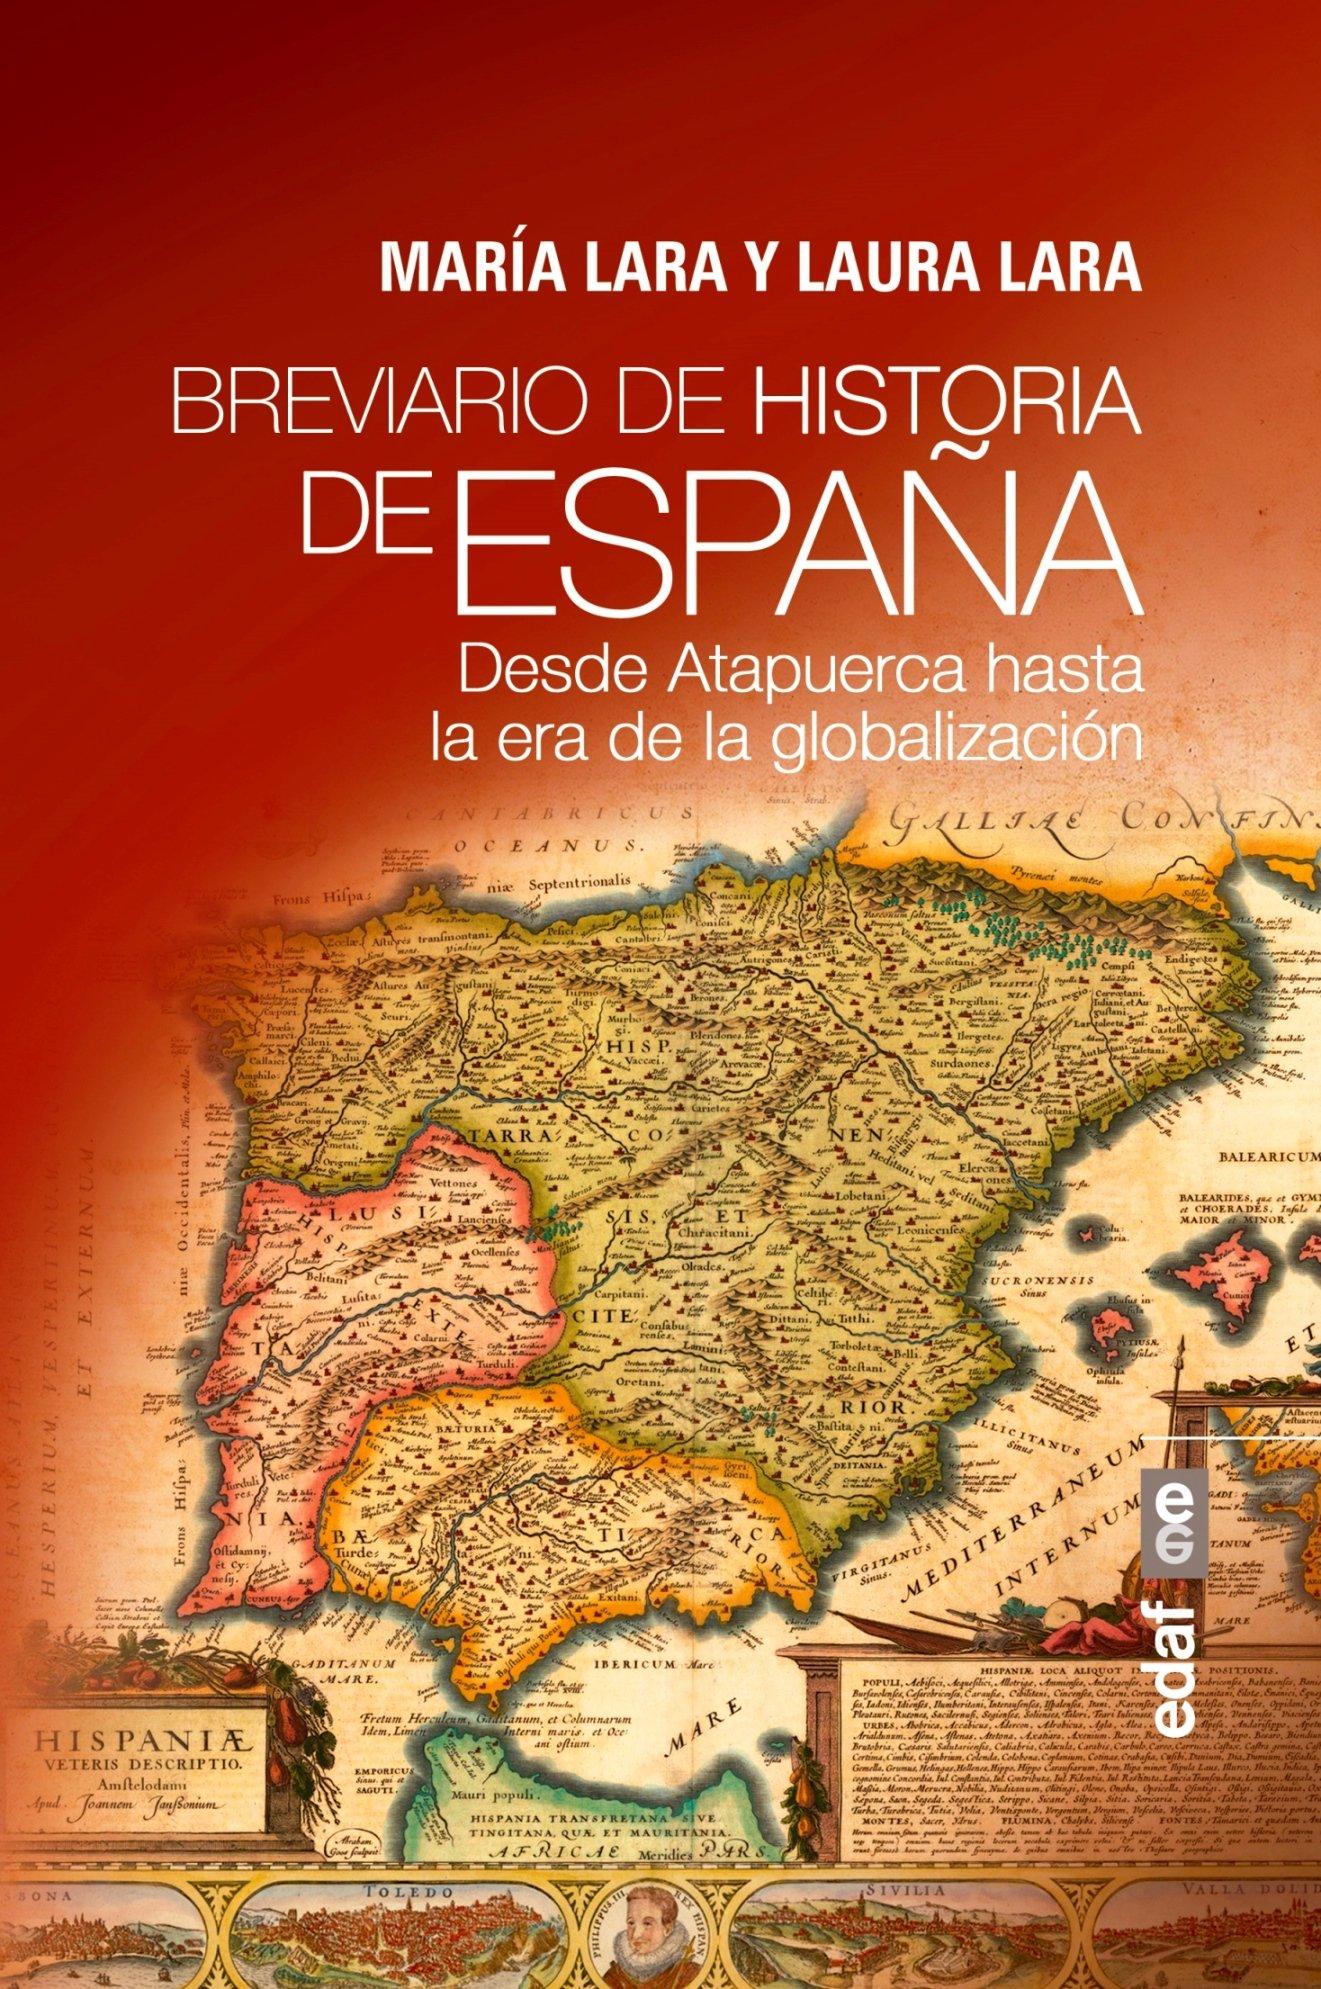 Breviario de la historia de Espana (Spanish Edition): Maria Lara, Laura Lara: 9788441438743: Amazon.com: Books